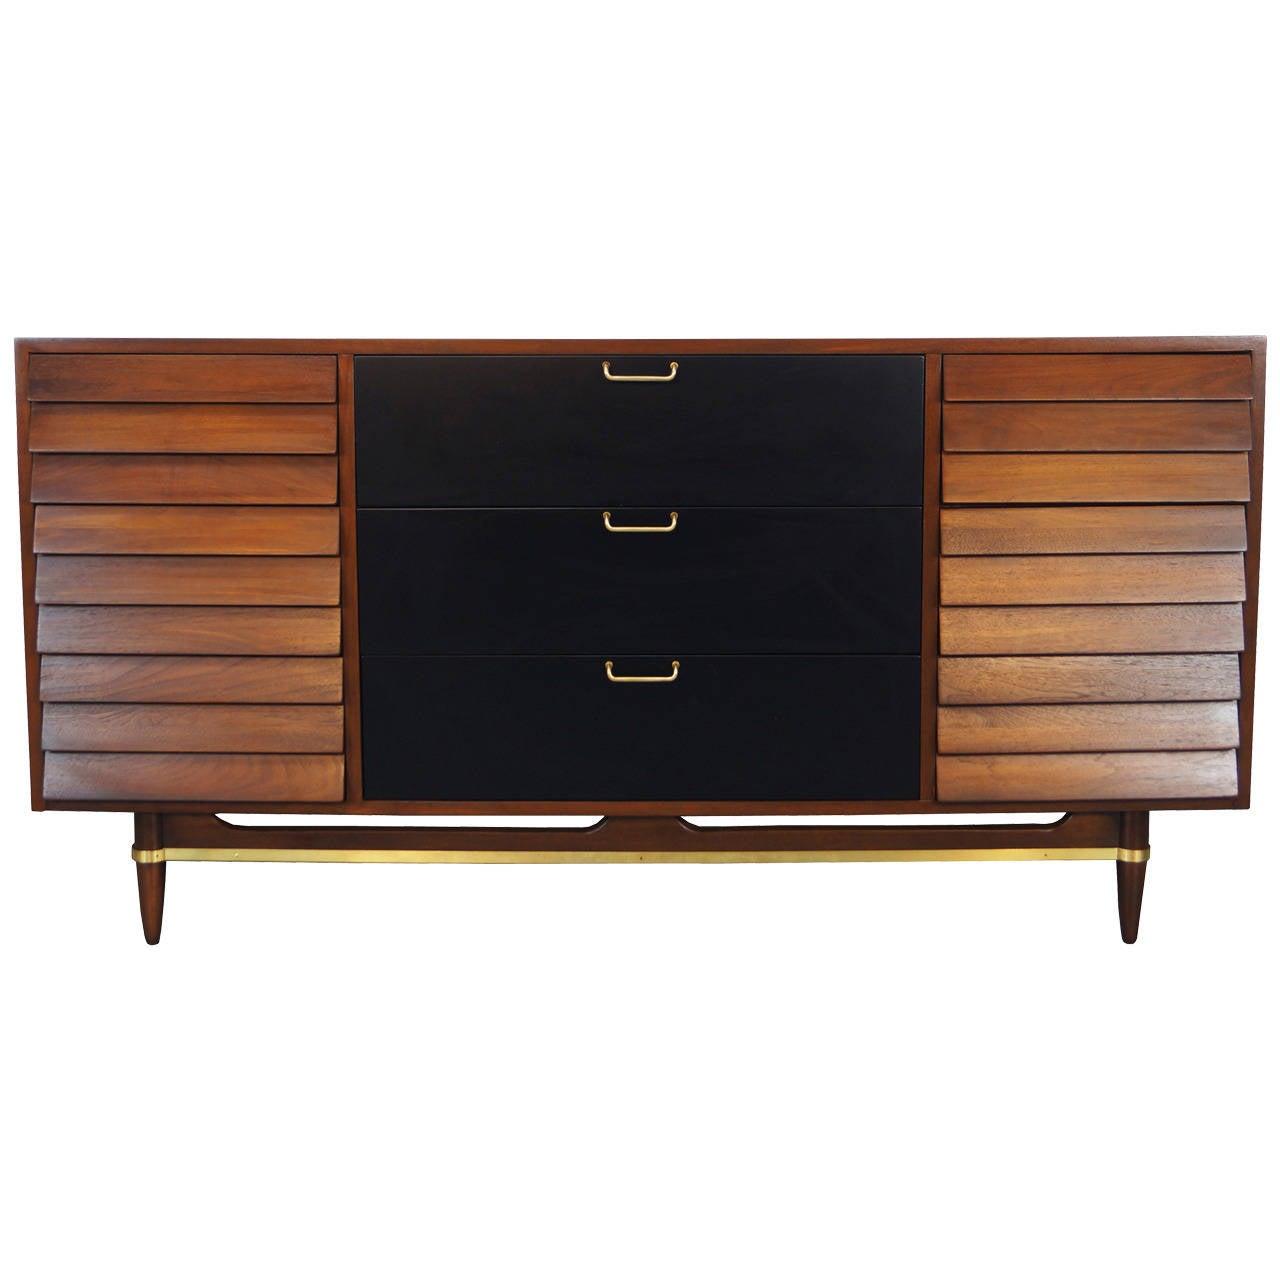 Vintage walnut dresser by american of martinsville for Vintage american martinsville bedroom furniture